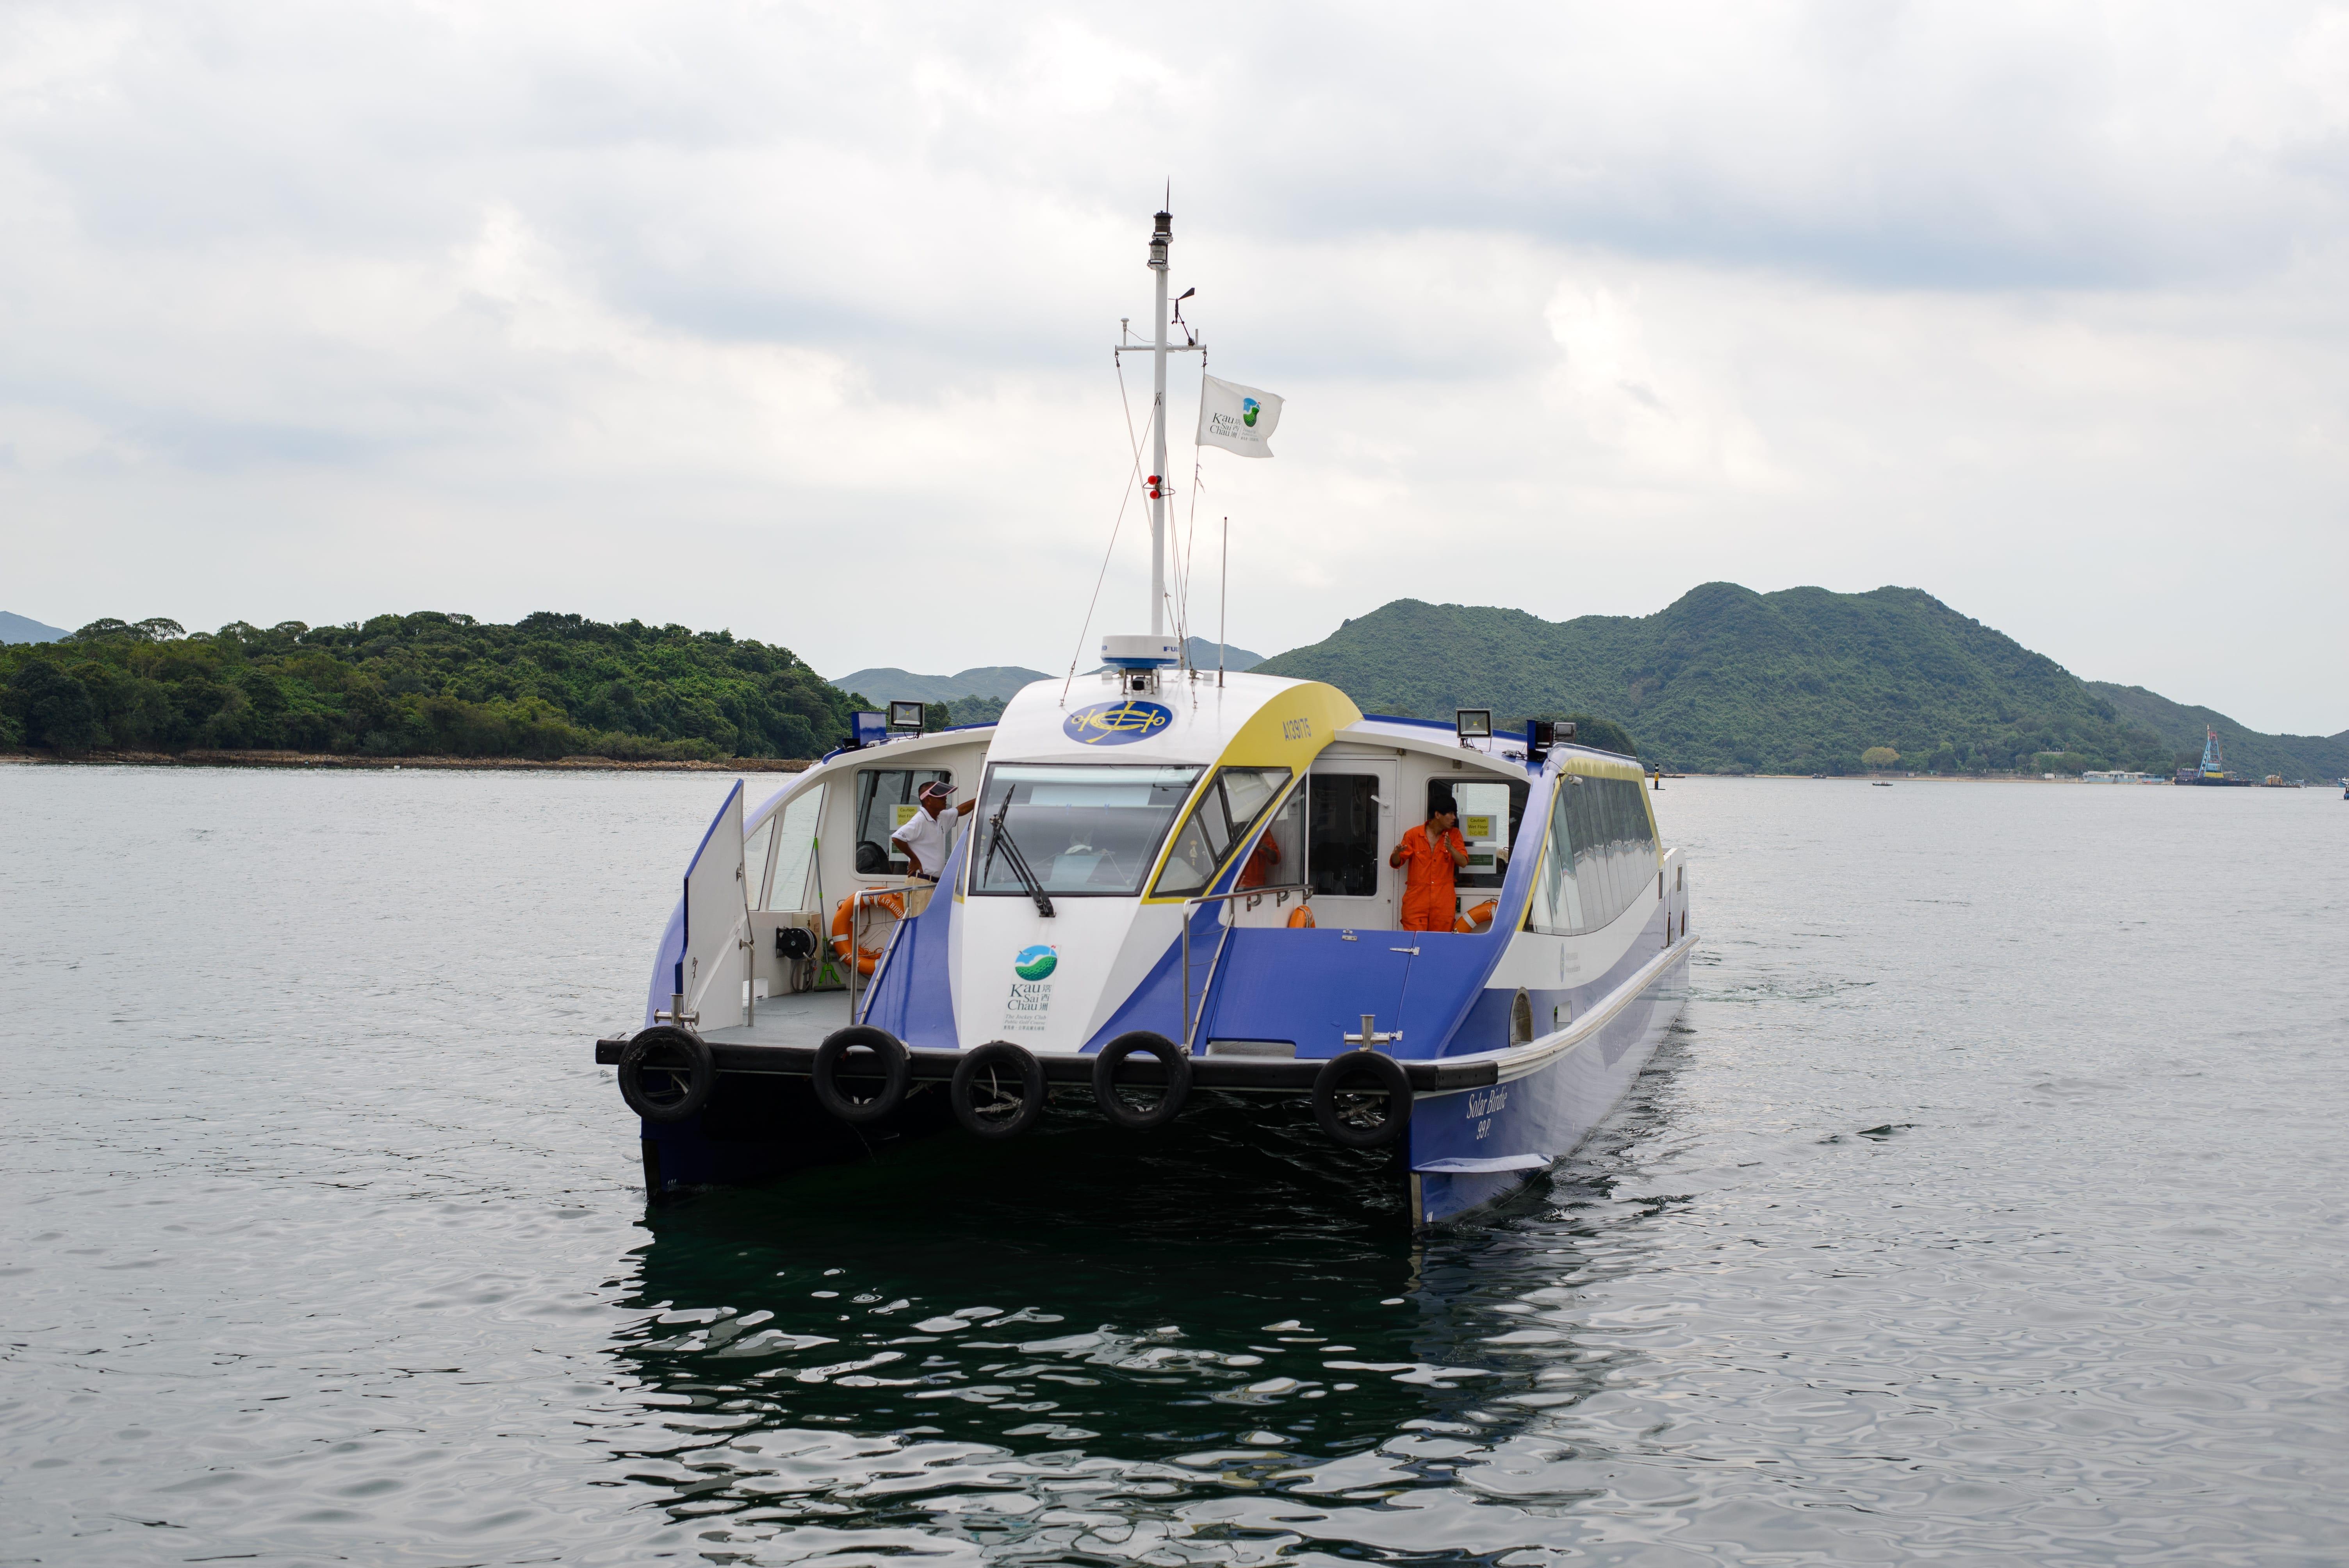 Jockey Club Ferry service to Kau Sai Chau